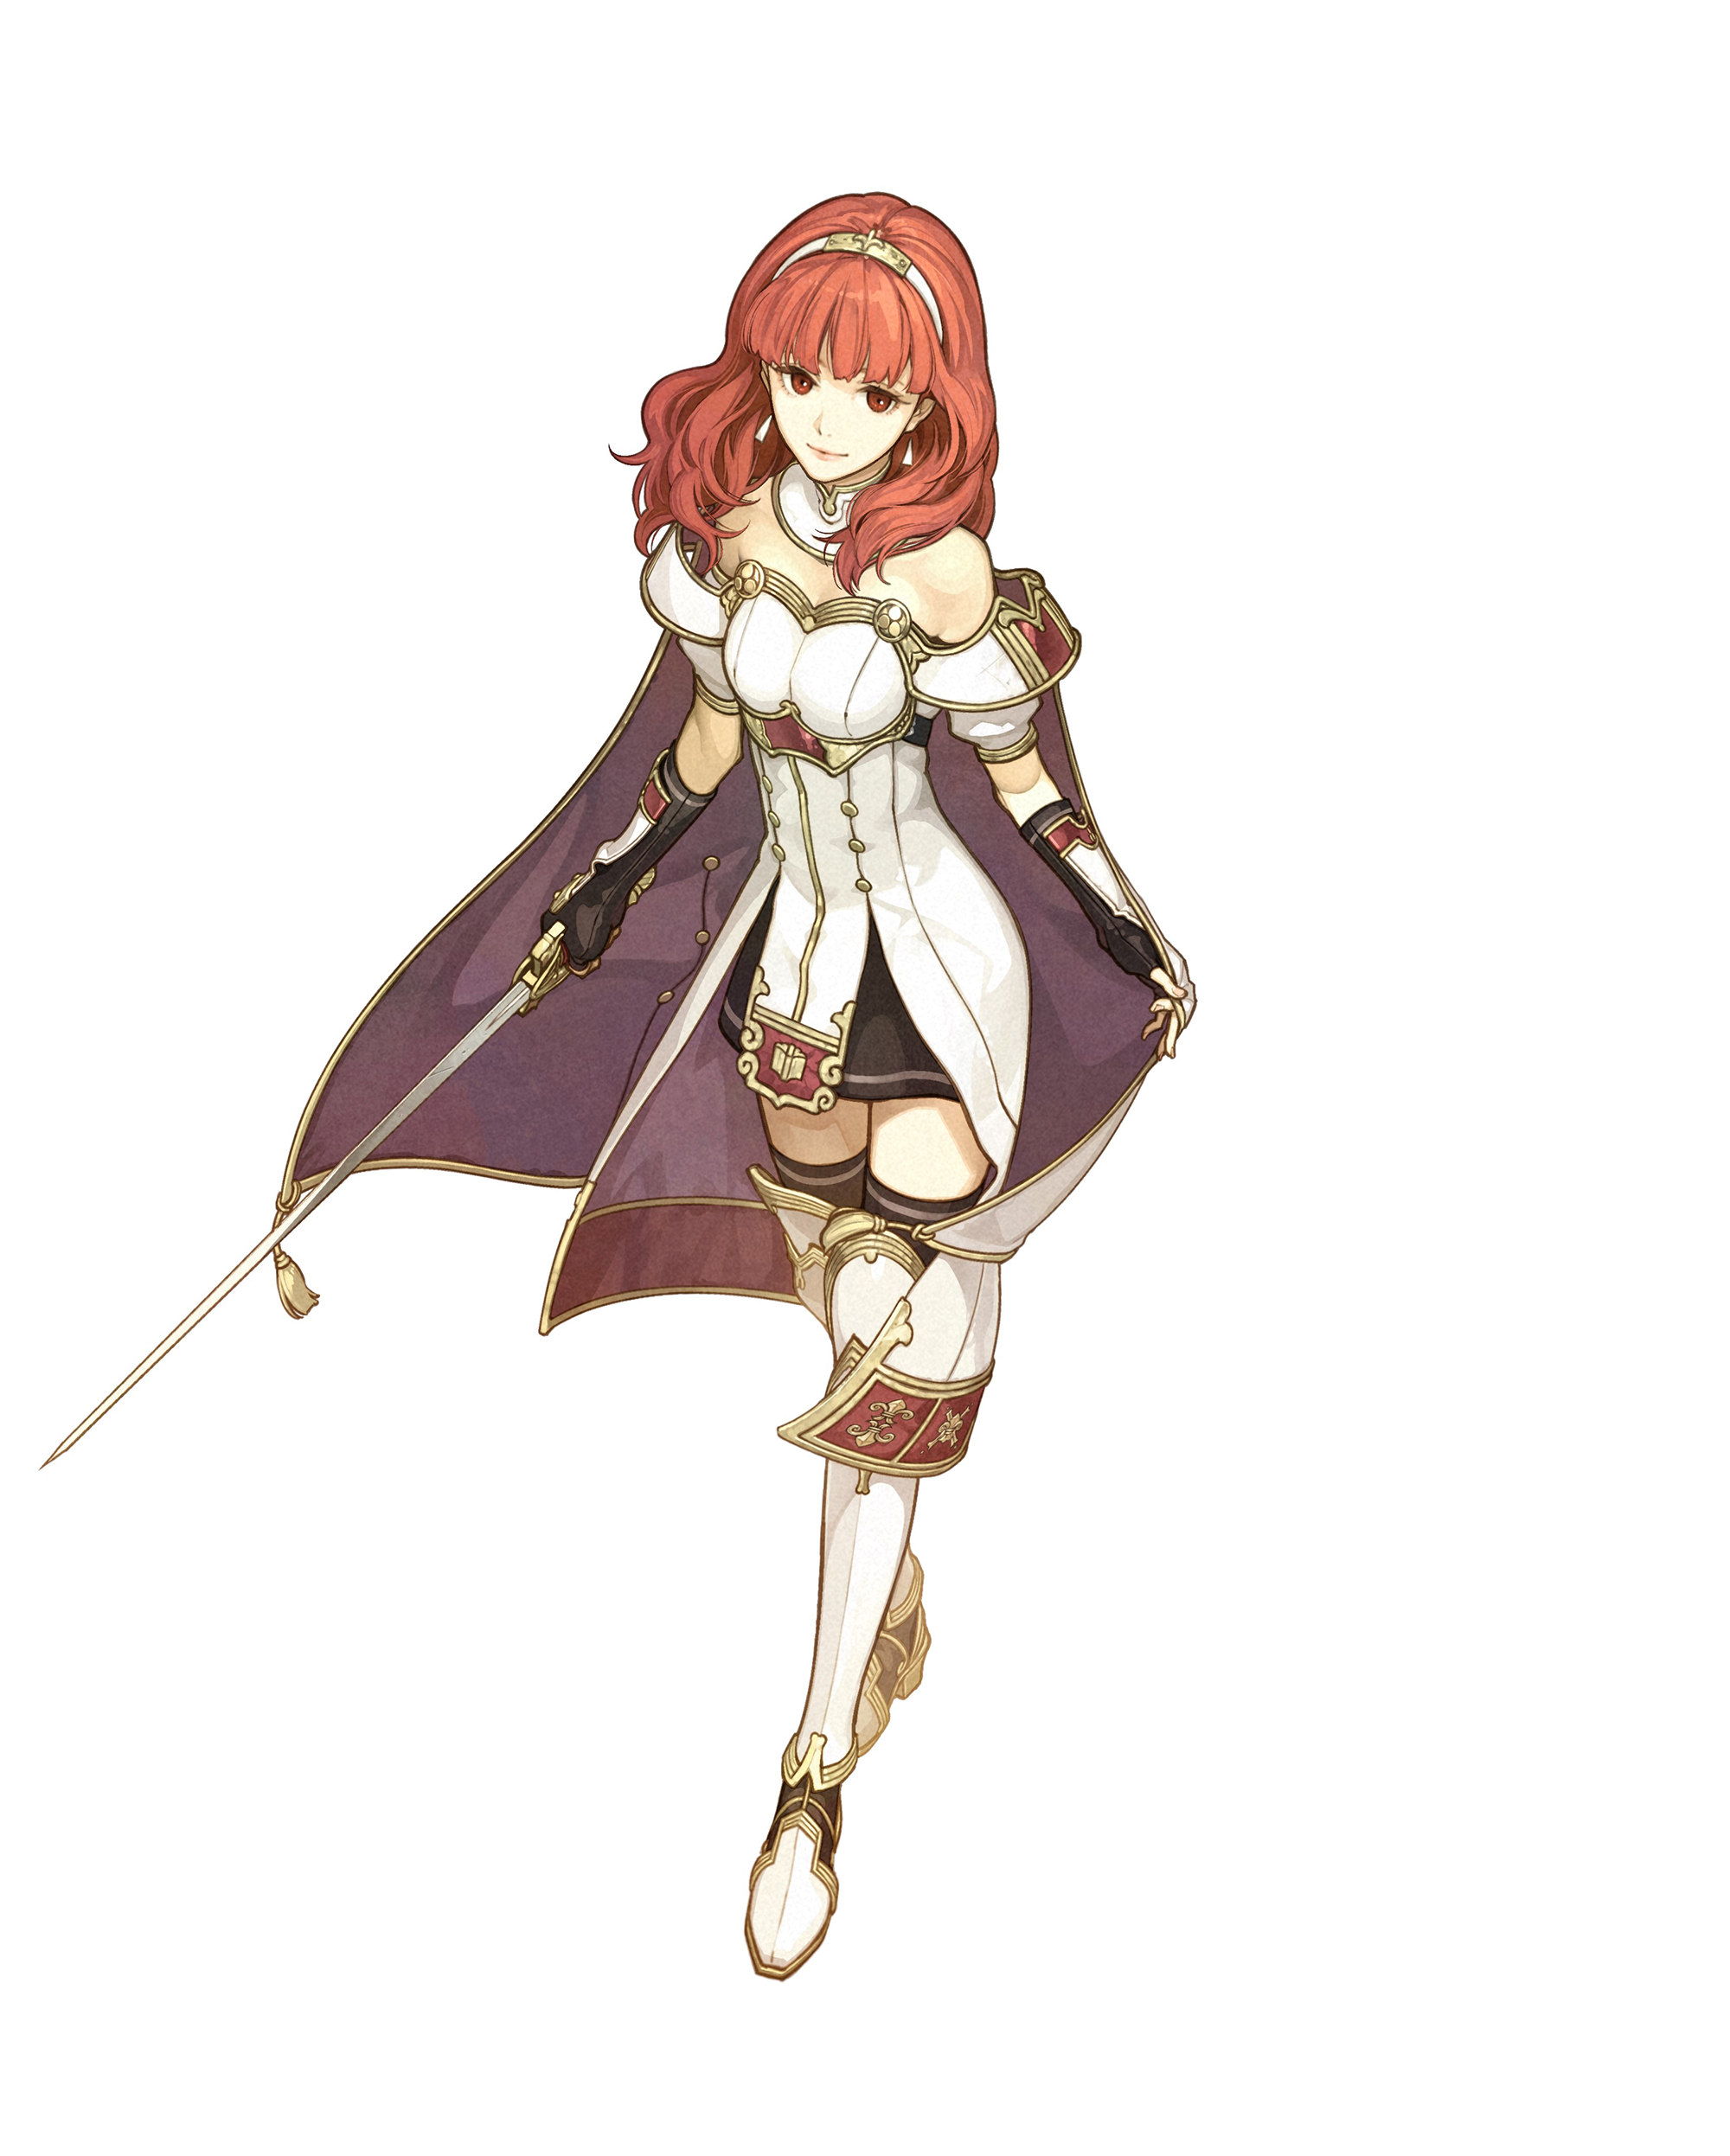 Fire Emblem Echoes Shadows Of Valentia Character Art 2